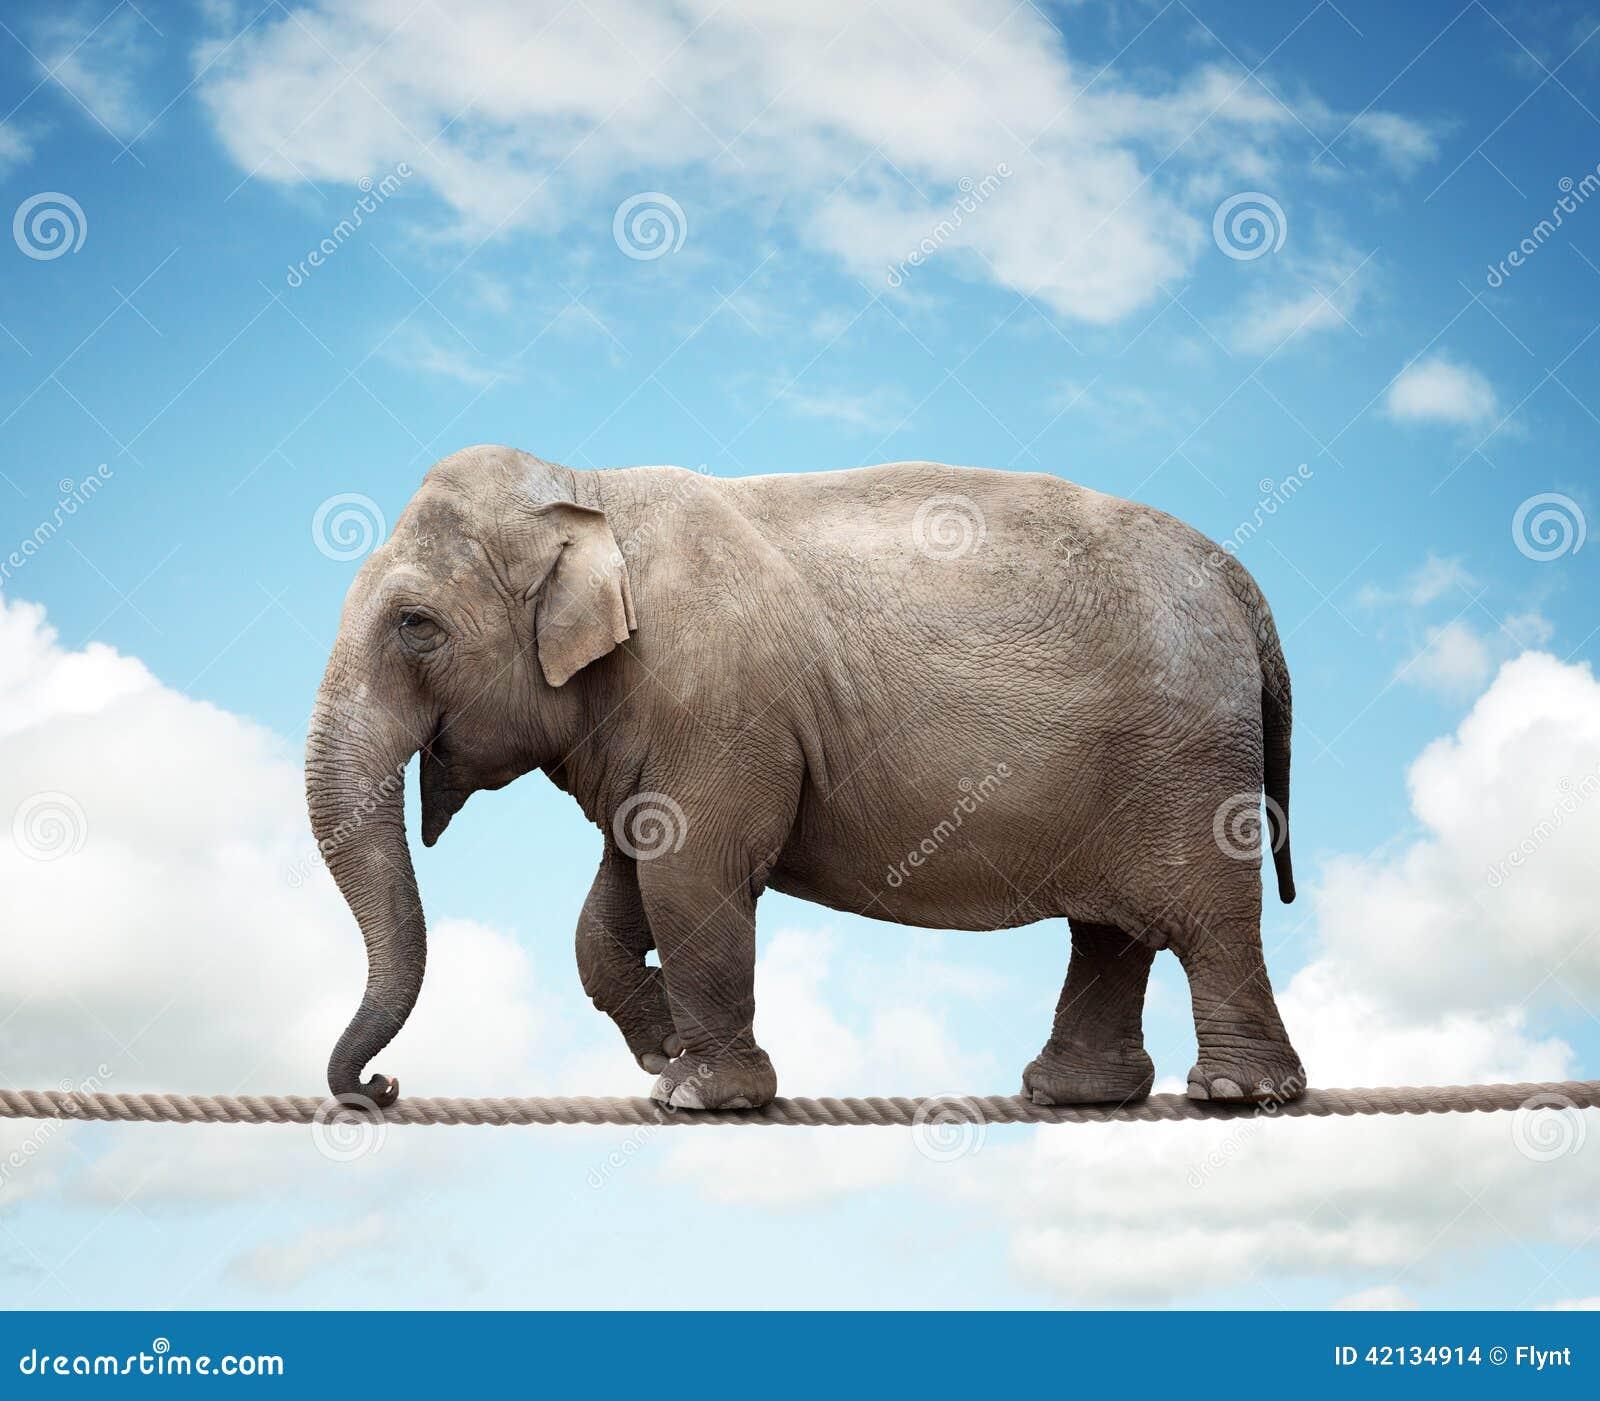 Elephant On A Tightrope Stock Photo Image 42134914